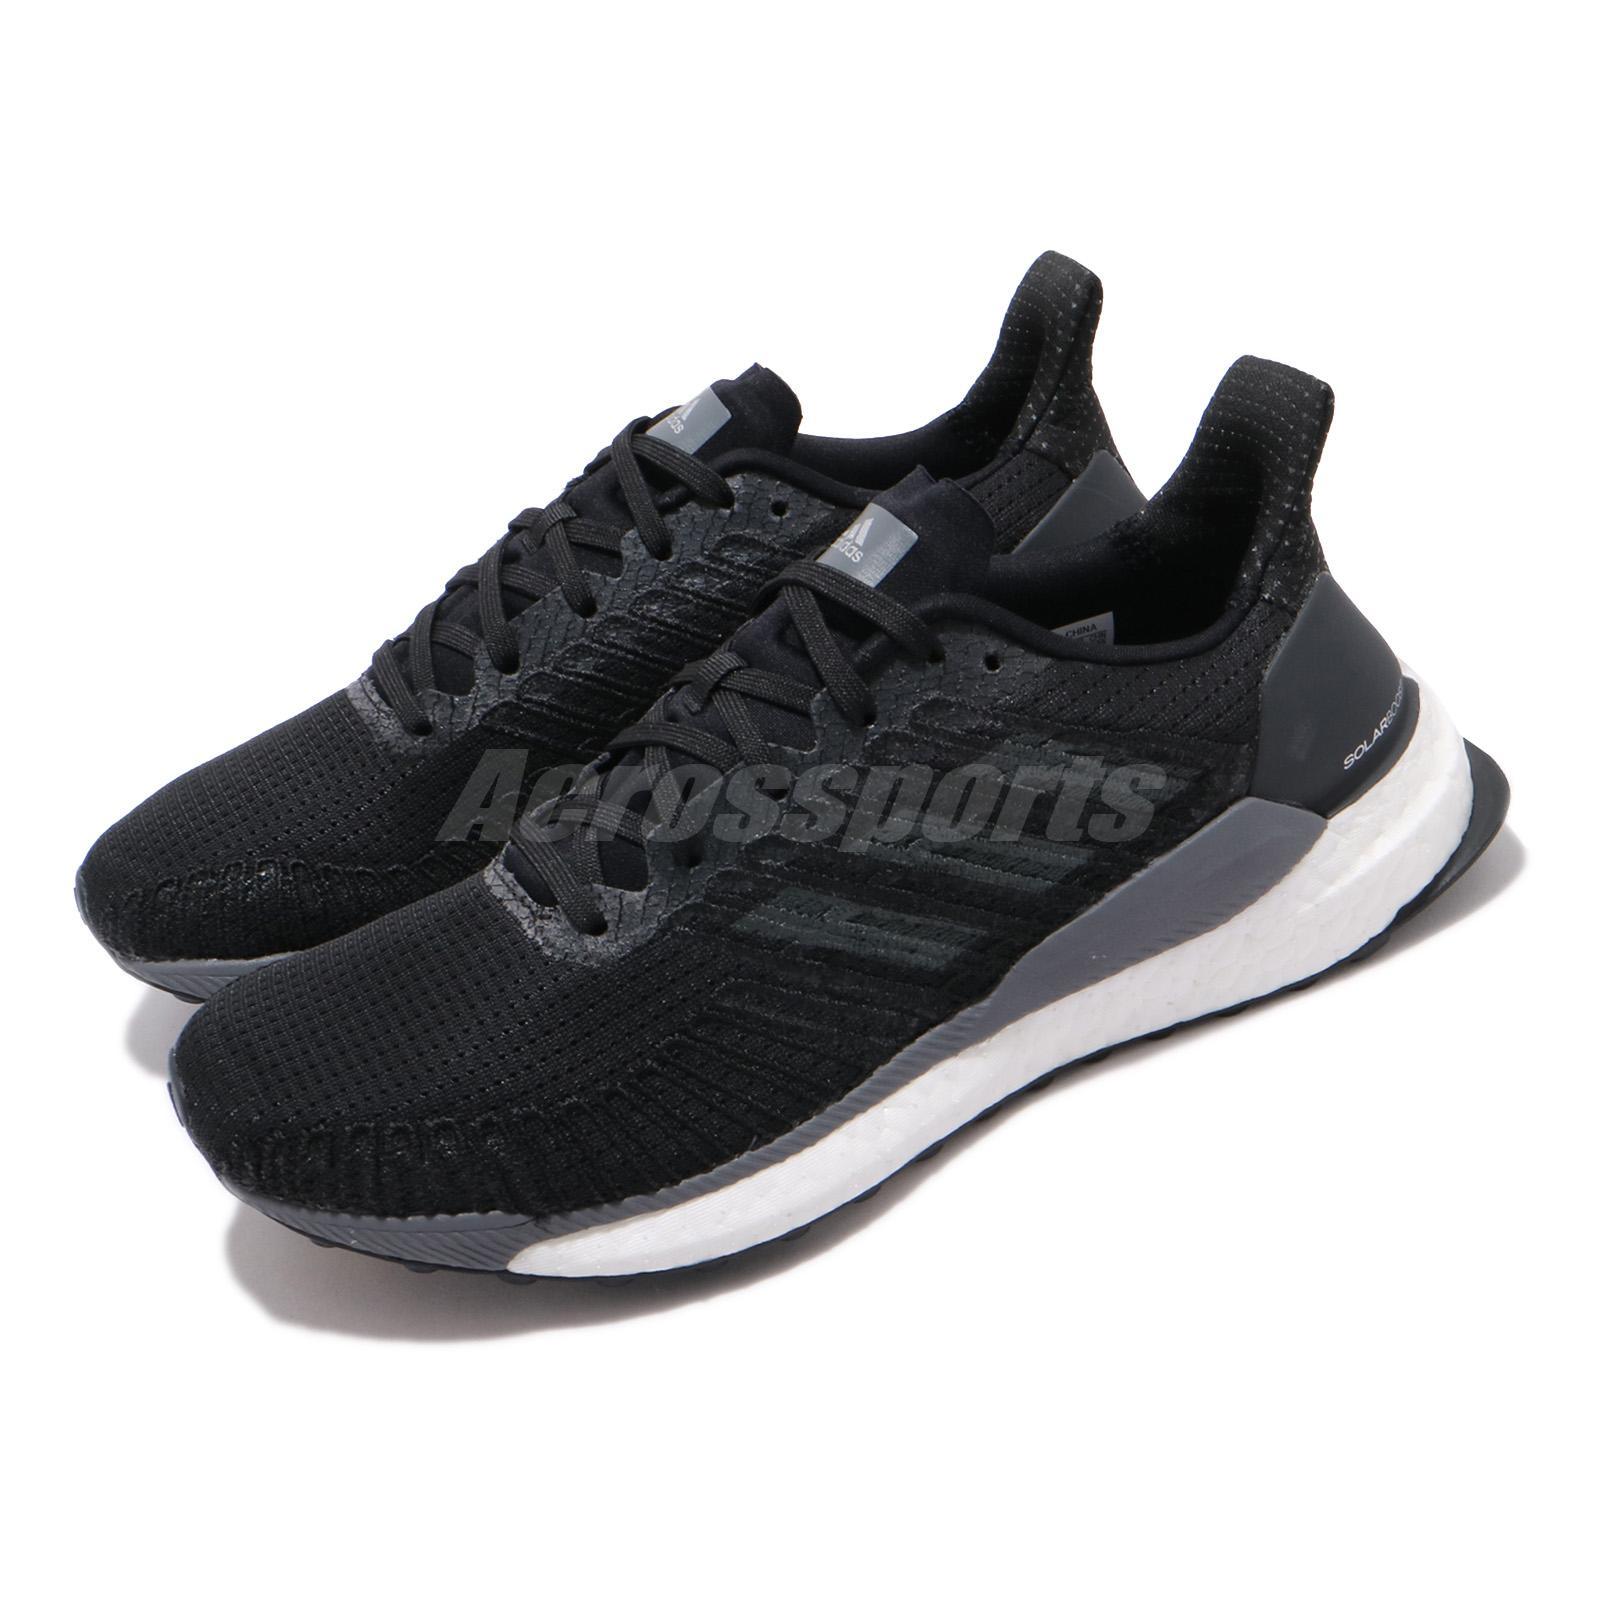 patrocinado cortar a tajos Anzai  adidas Solar Boost 19 W Black Grey White Women Running Shoes Sneakers  F34086 | eBay